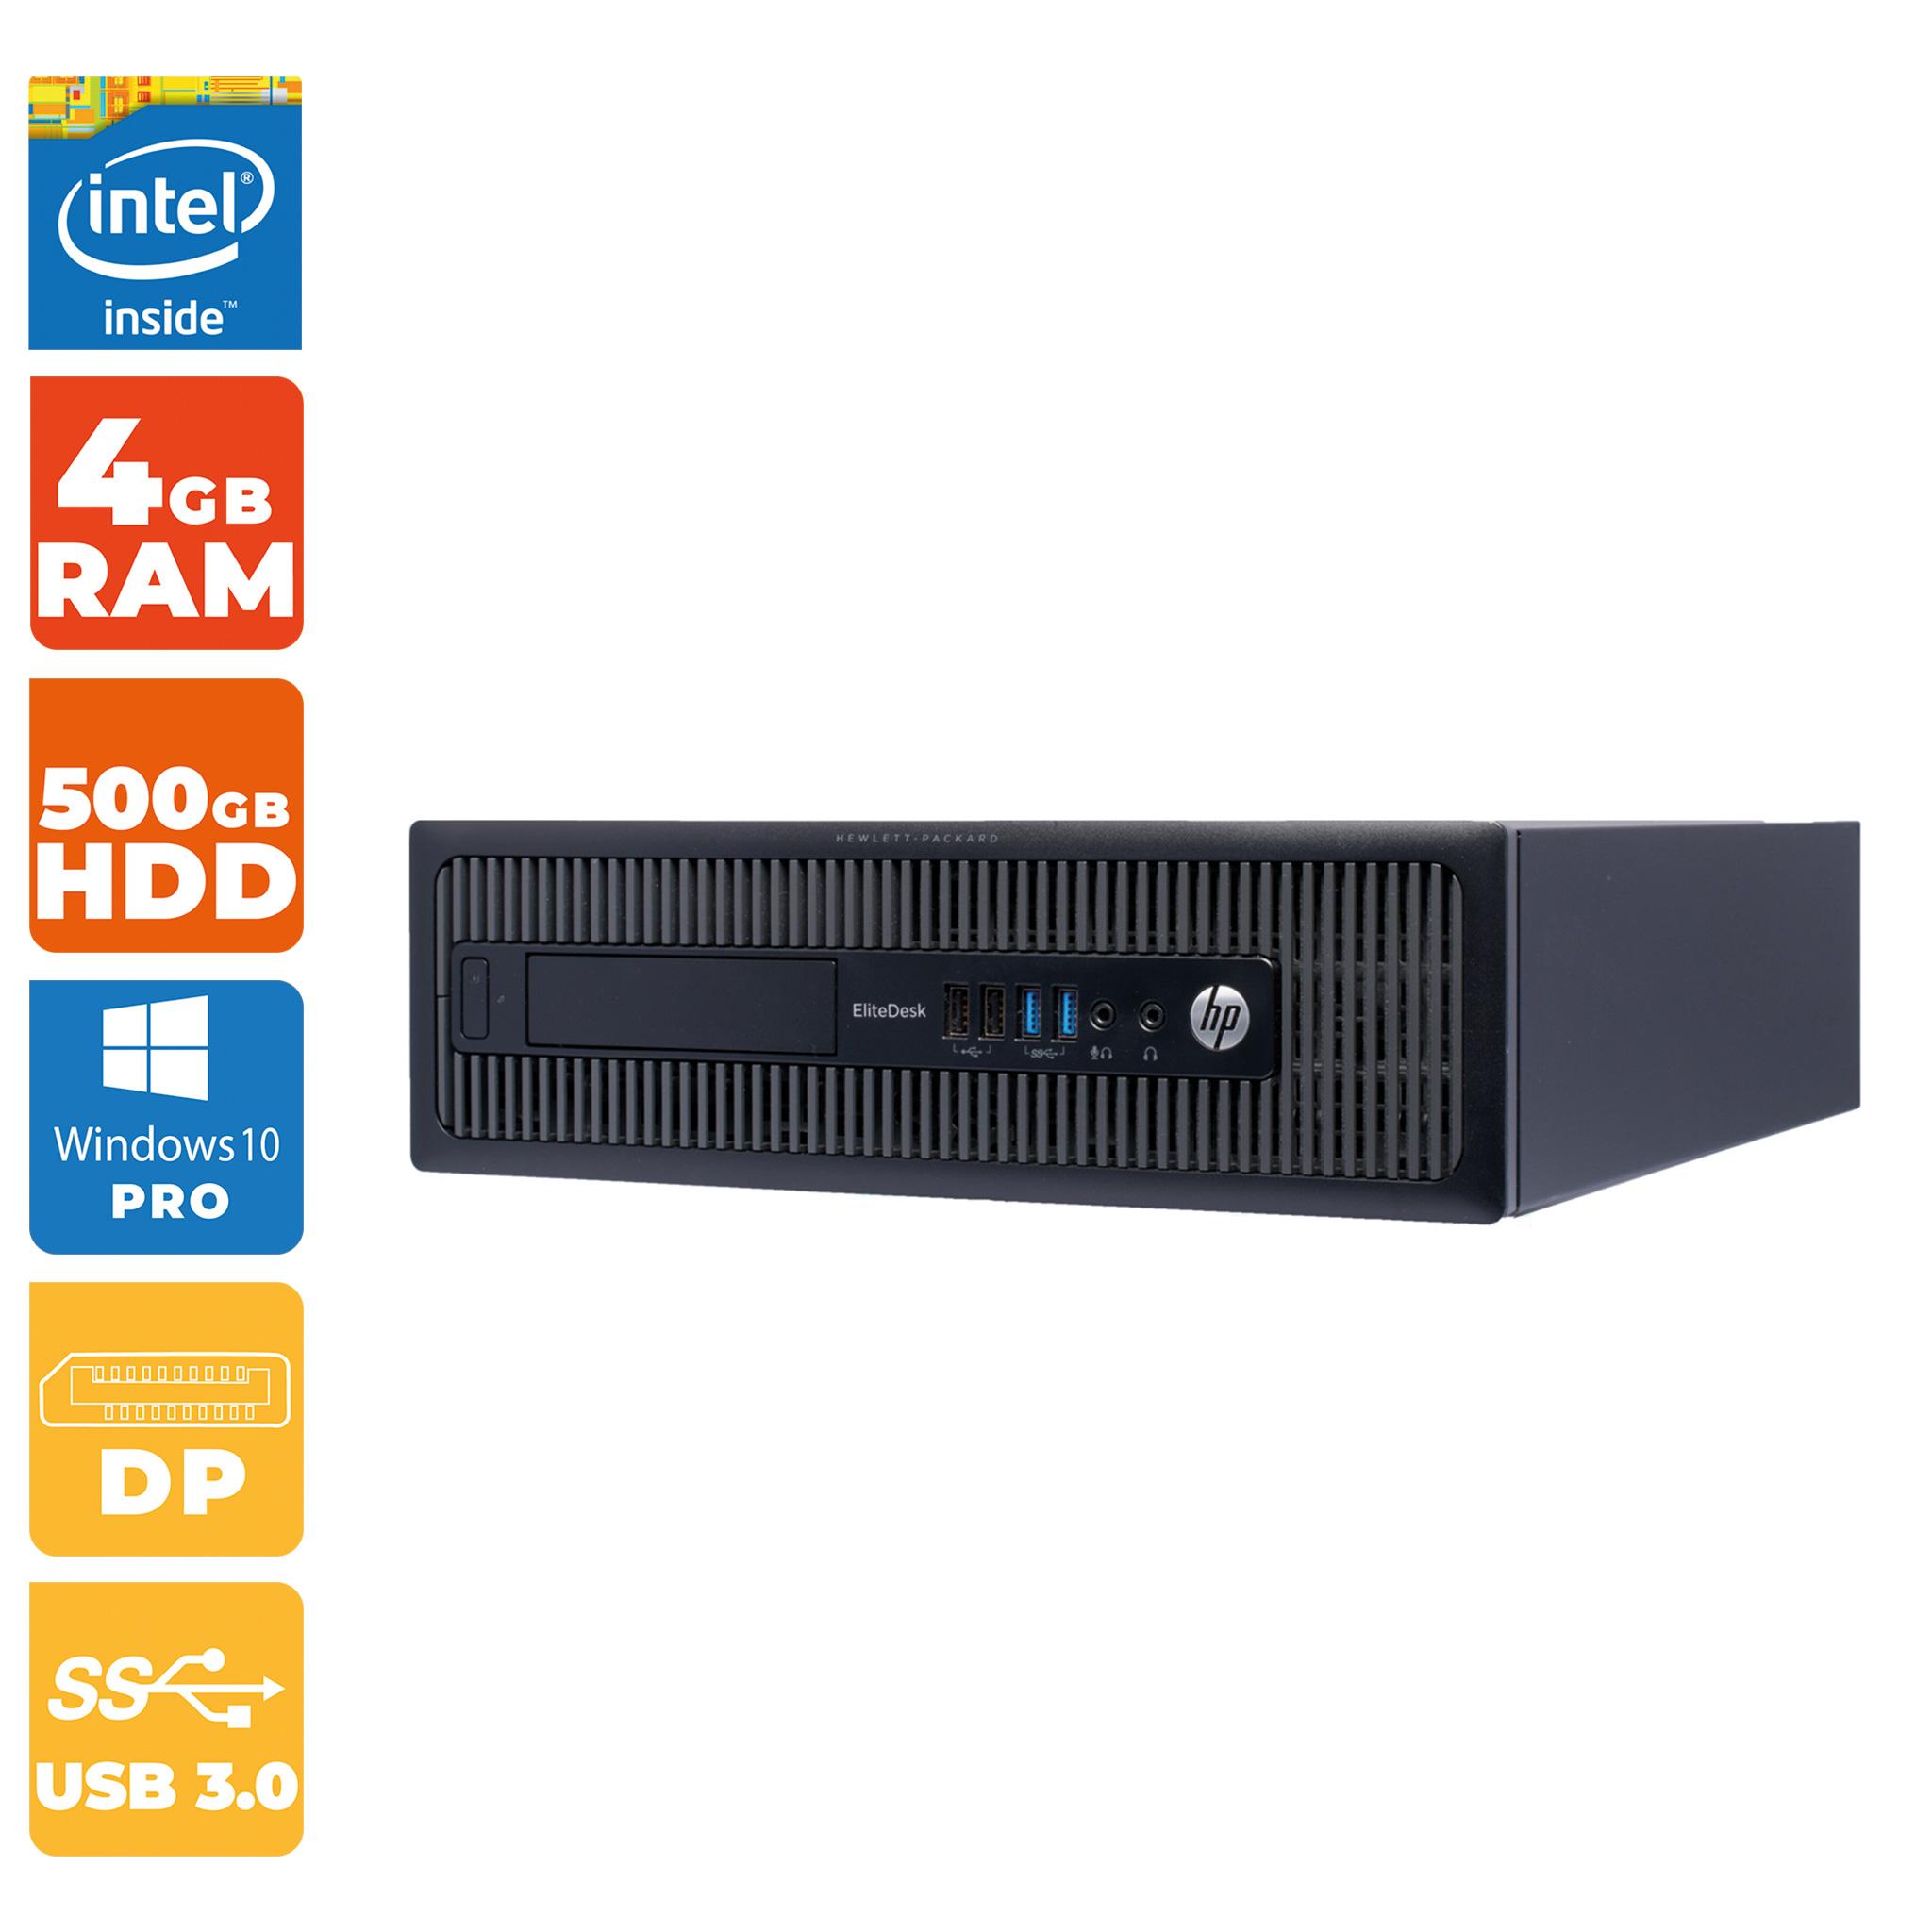 Office-Rechner HP EliteDesk 800 G1 SFF ( Intel i5- 4.Gen, 4GB DDR3-RAM, 500GB, 8x USB 3.0, 2x USB 3.0, 2x DisplayPort, Windows 10 Pro )